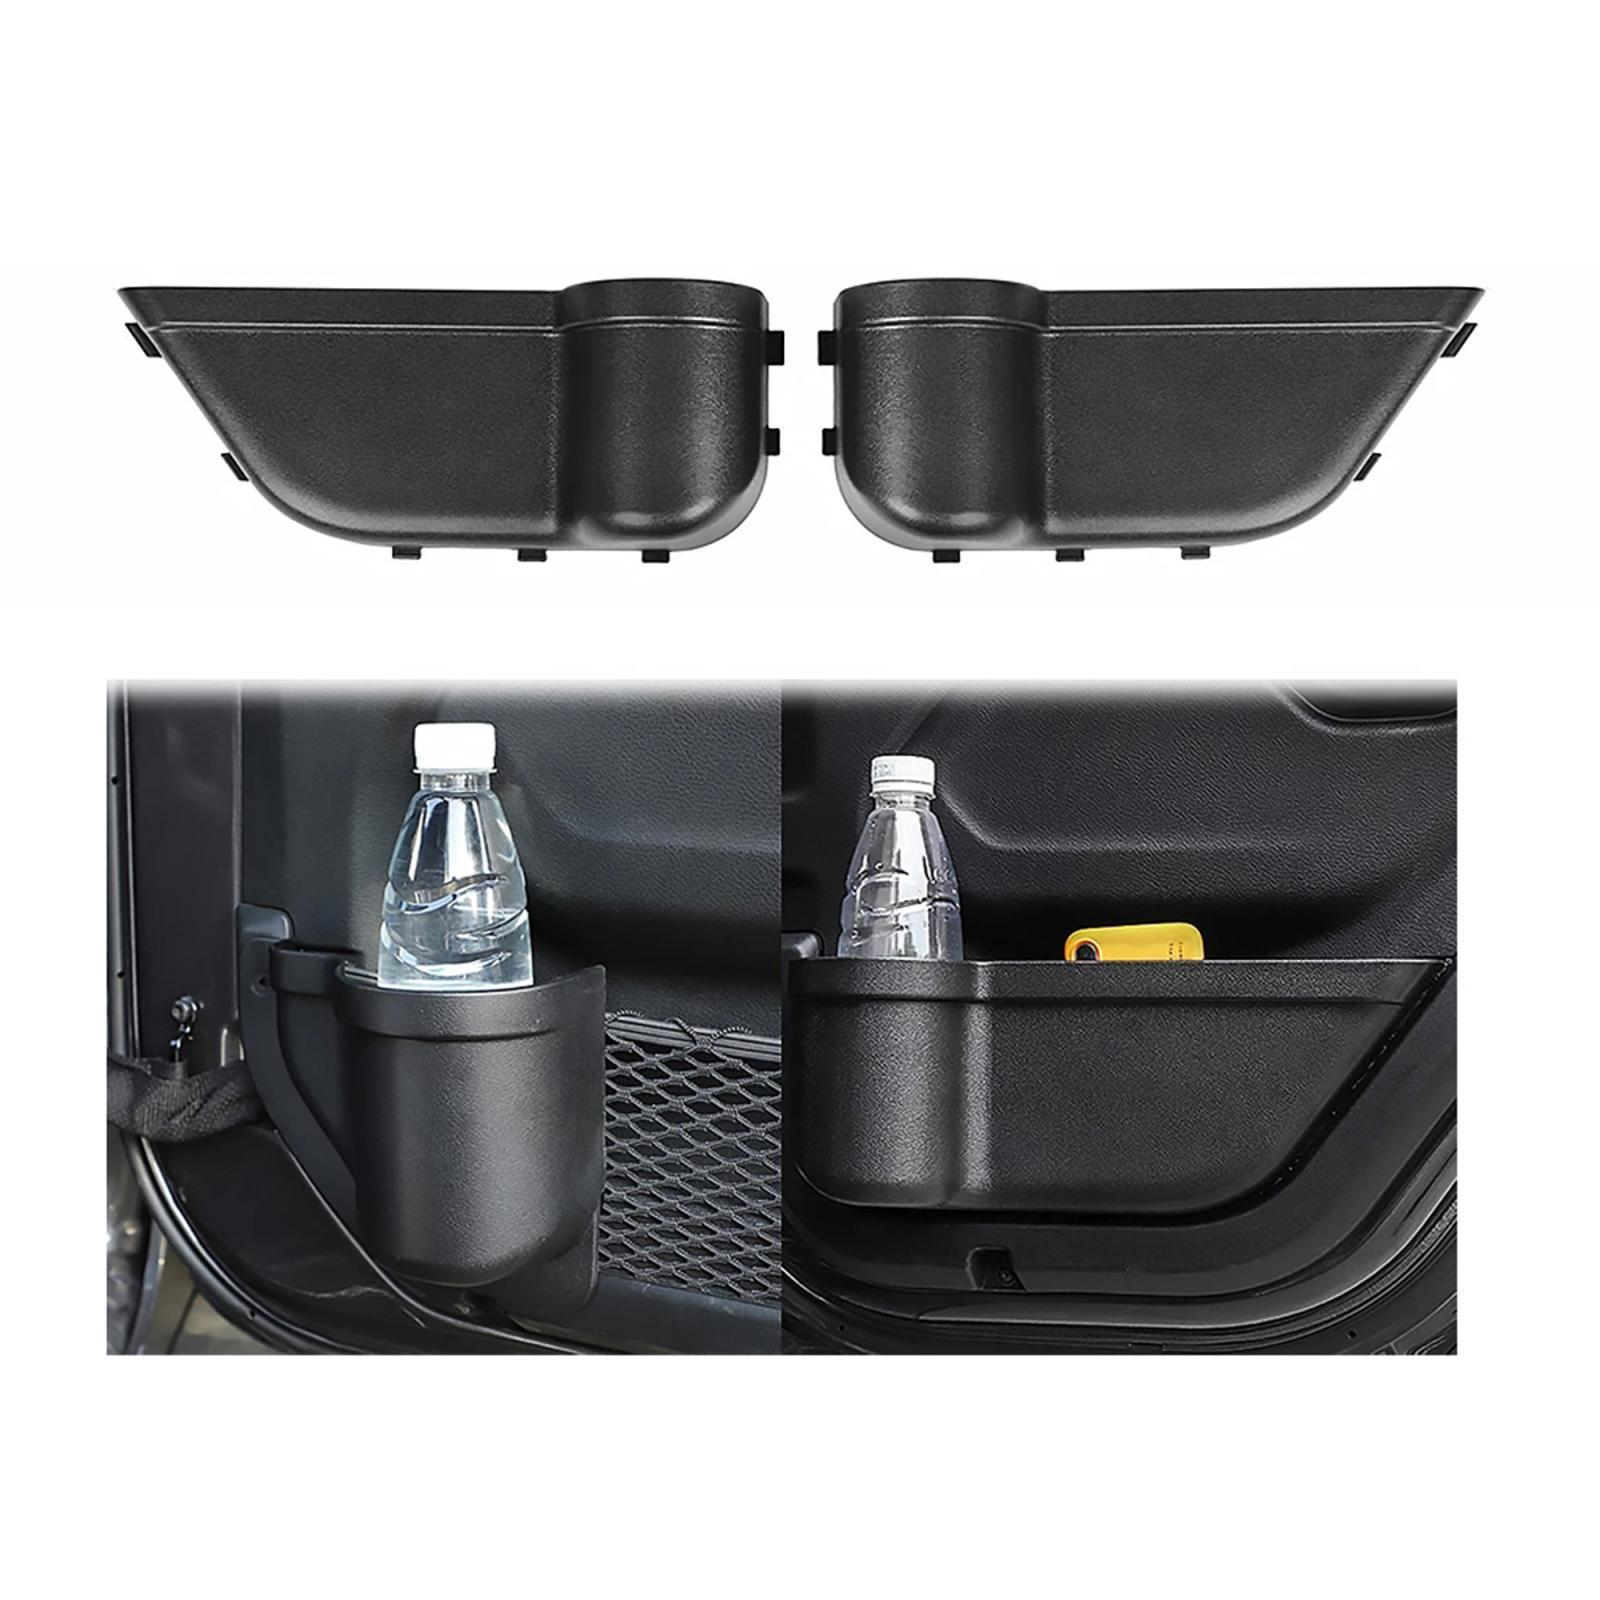 thumbnail 4 - ABS Door Storage Organizer Phone Holder for Jeep Wrangler JL 2018-2020 Black